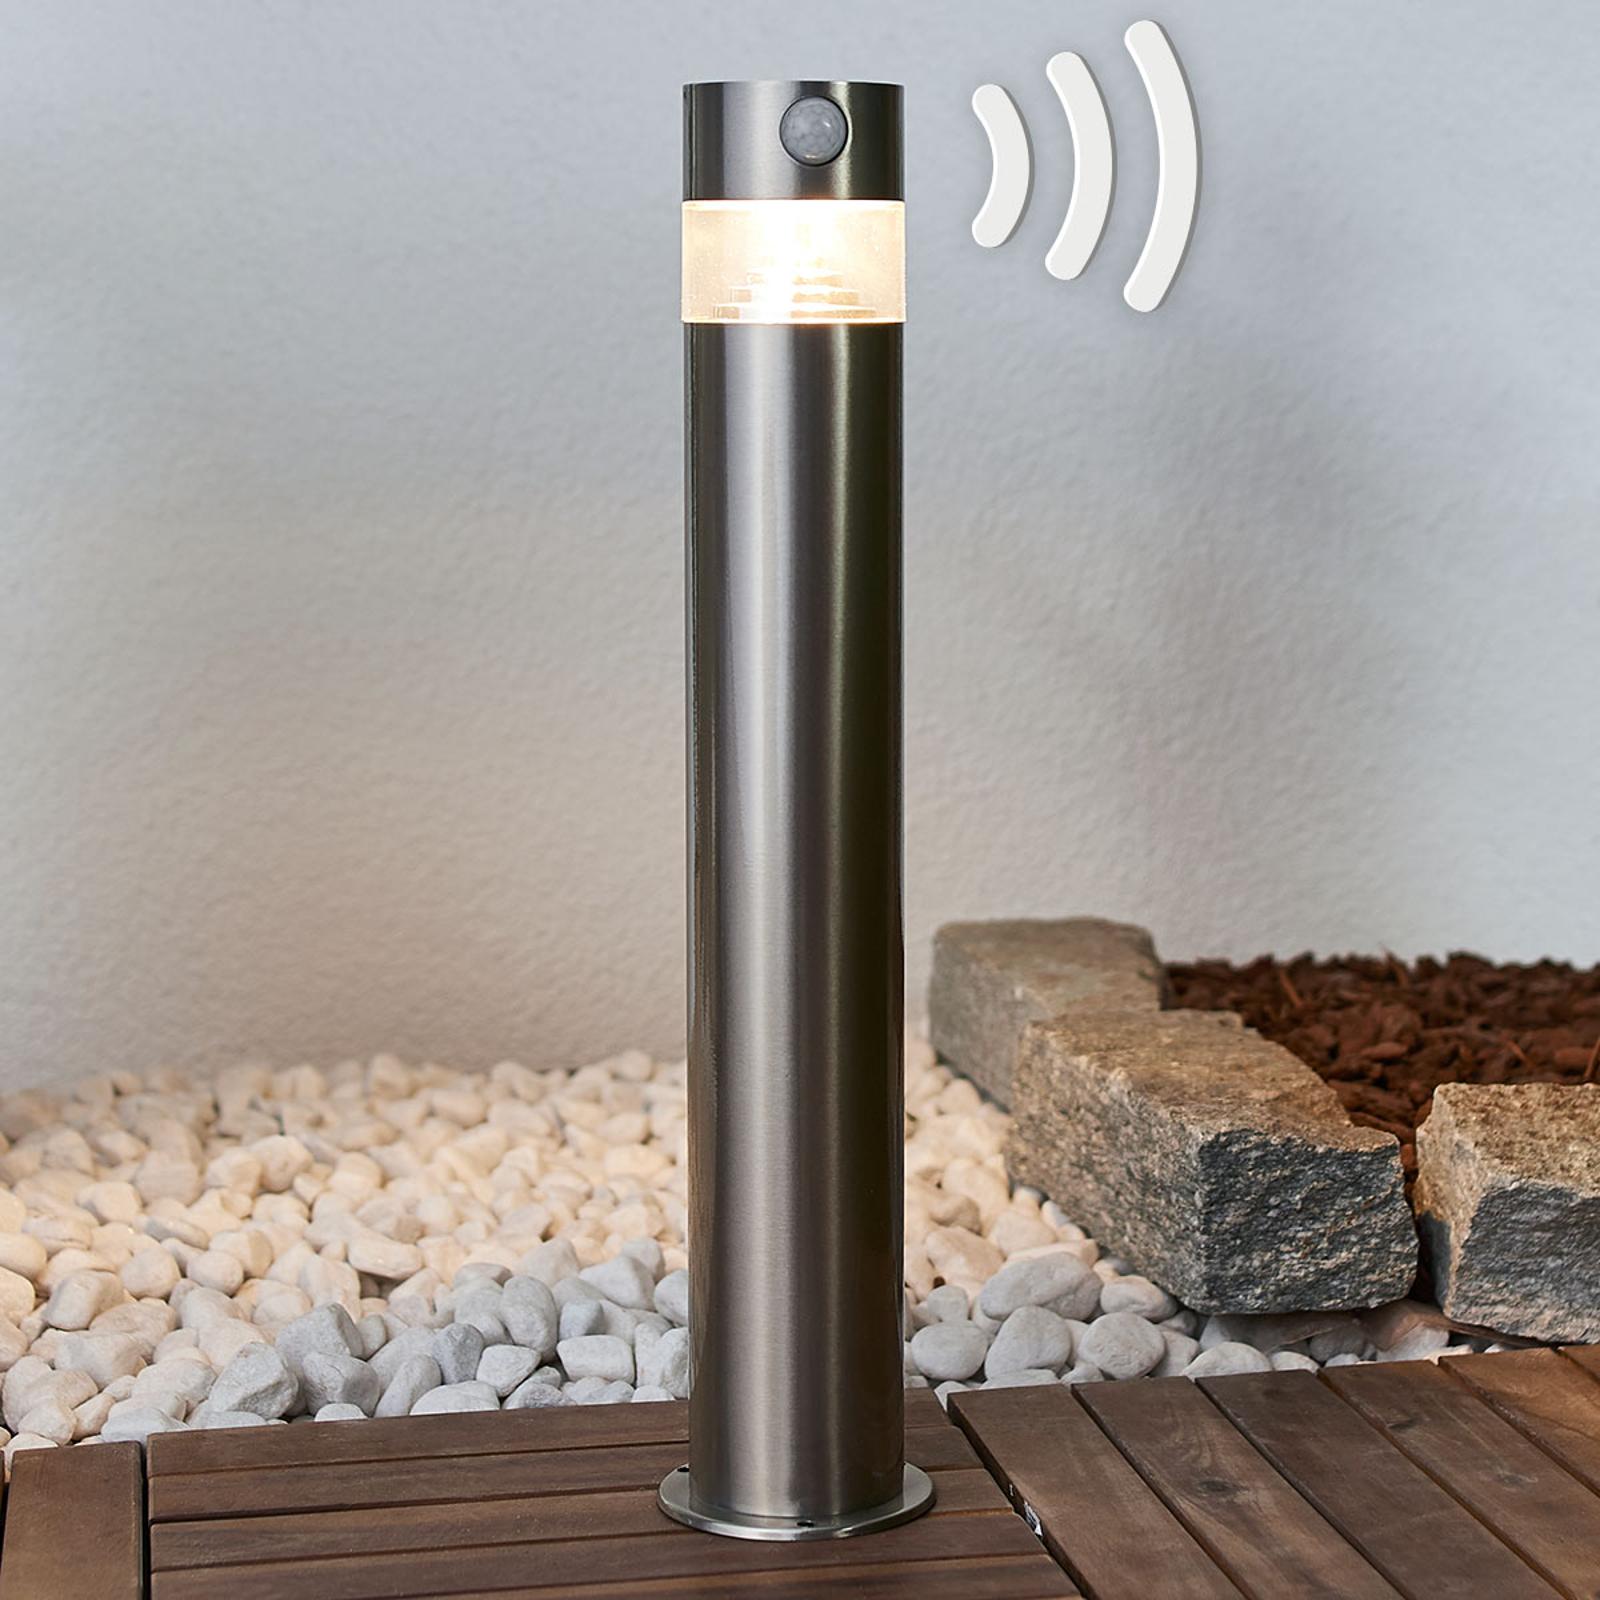 Kalypso - lampioncino a LED solare in acciaio inox